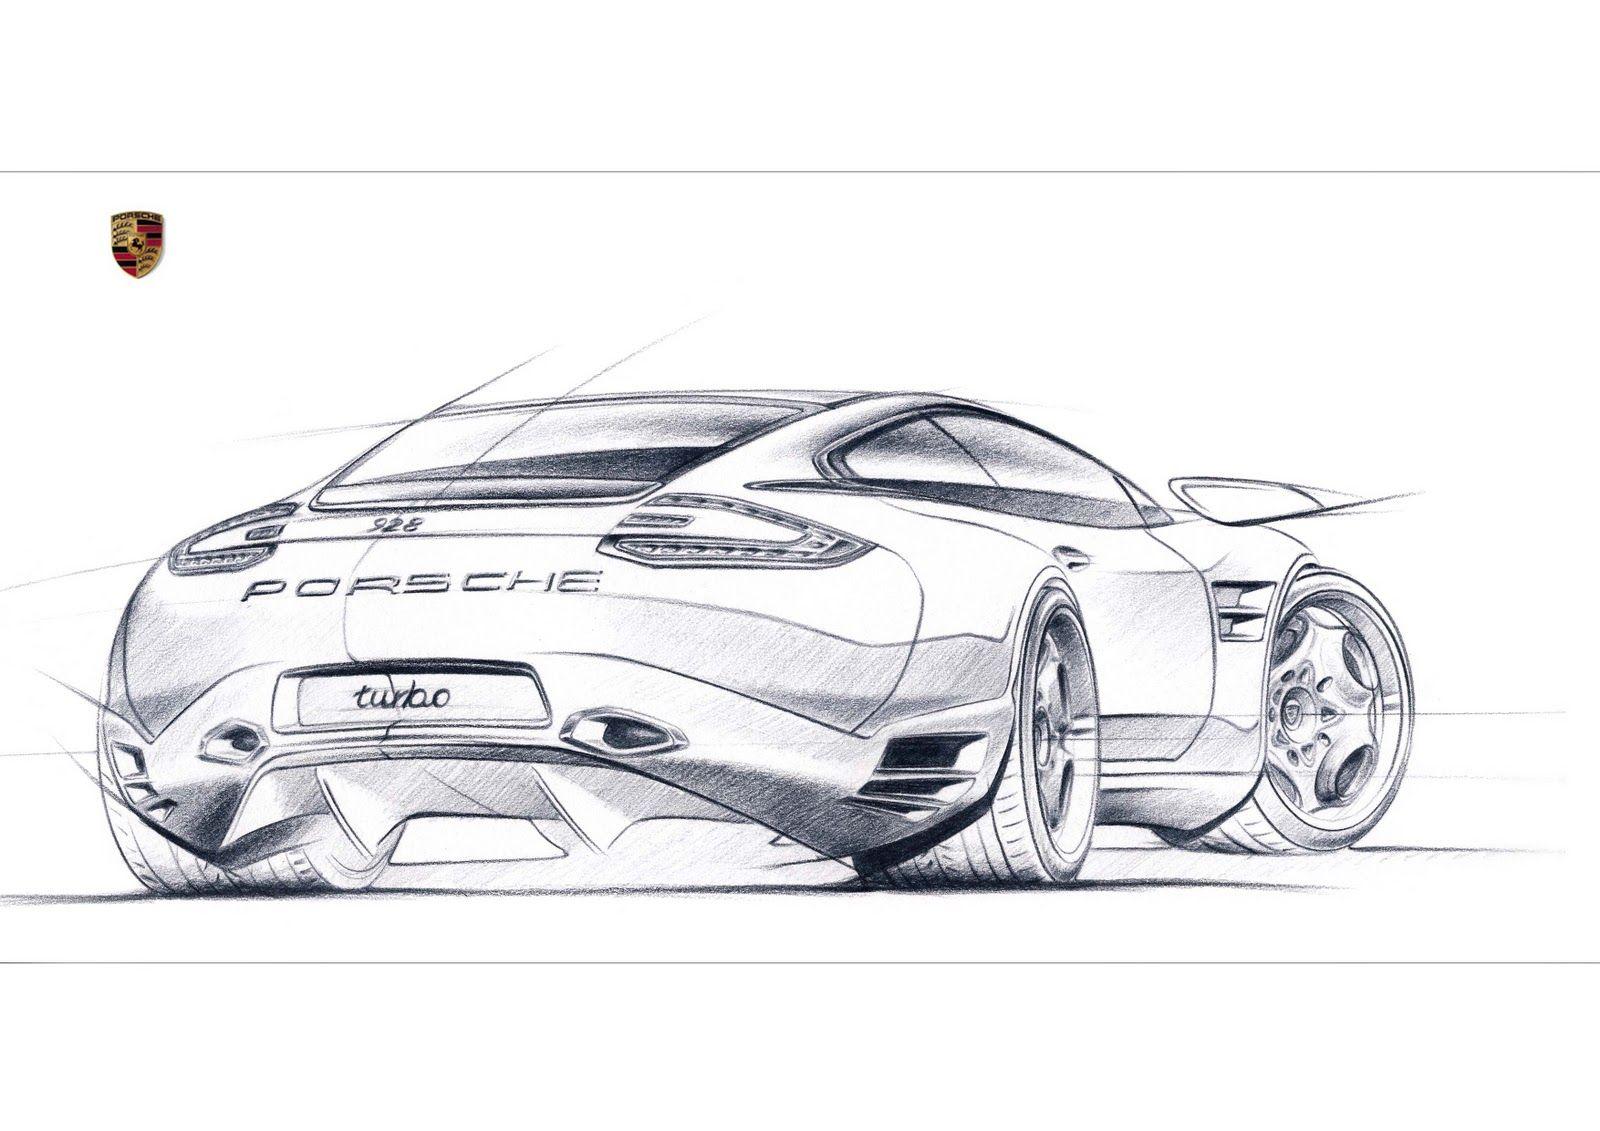 disegno | Schizzo | Pinterest | Skizzen, Auto skizze und Autos